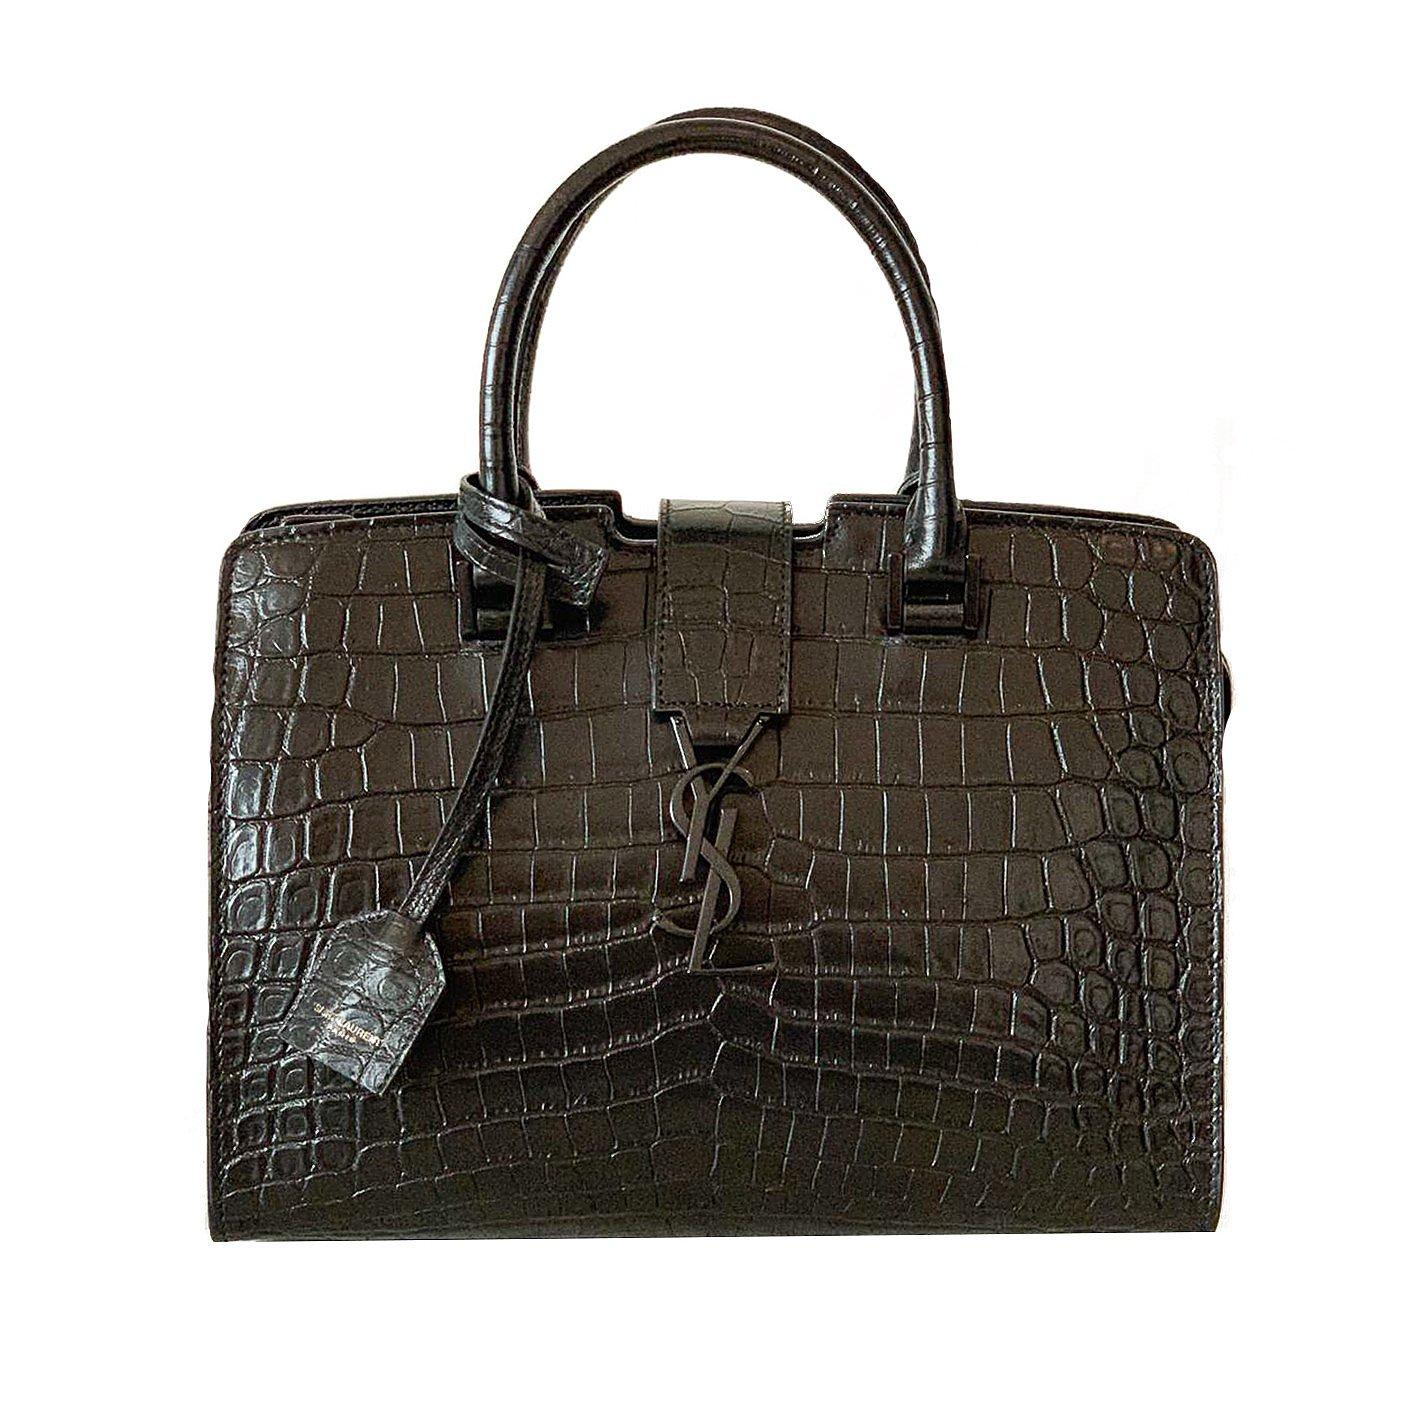 Saint Laurent Small Monogram Cabas In Crocodile Leather